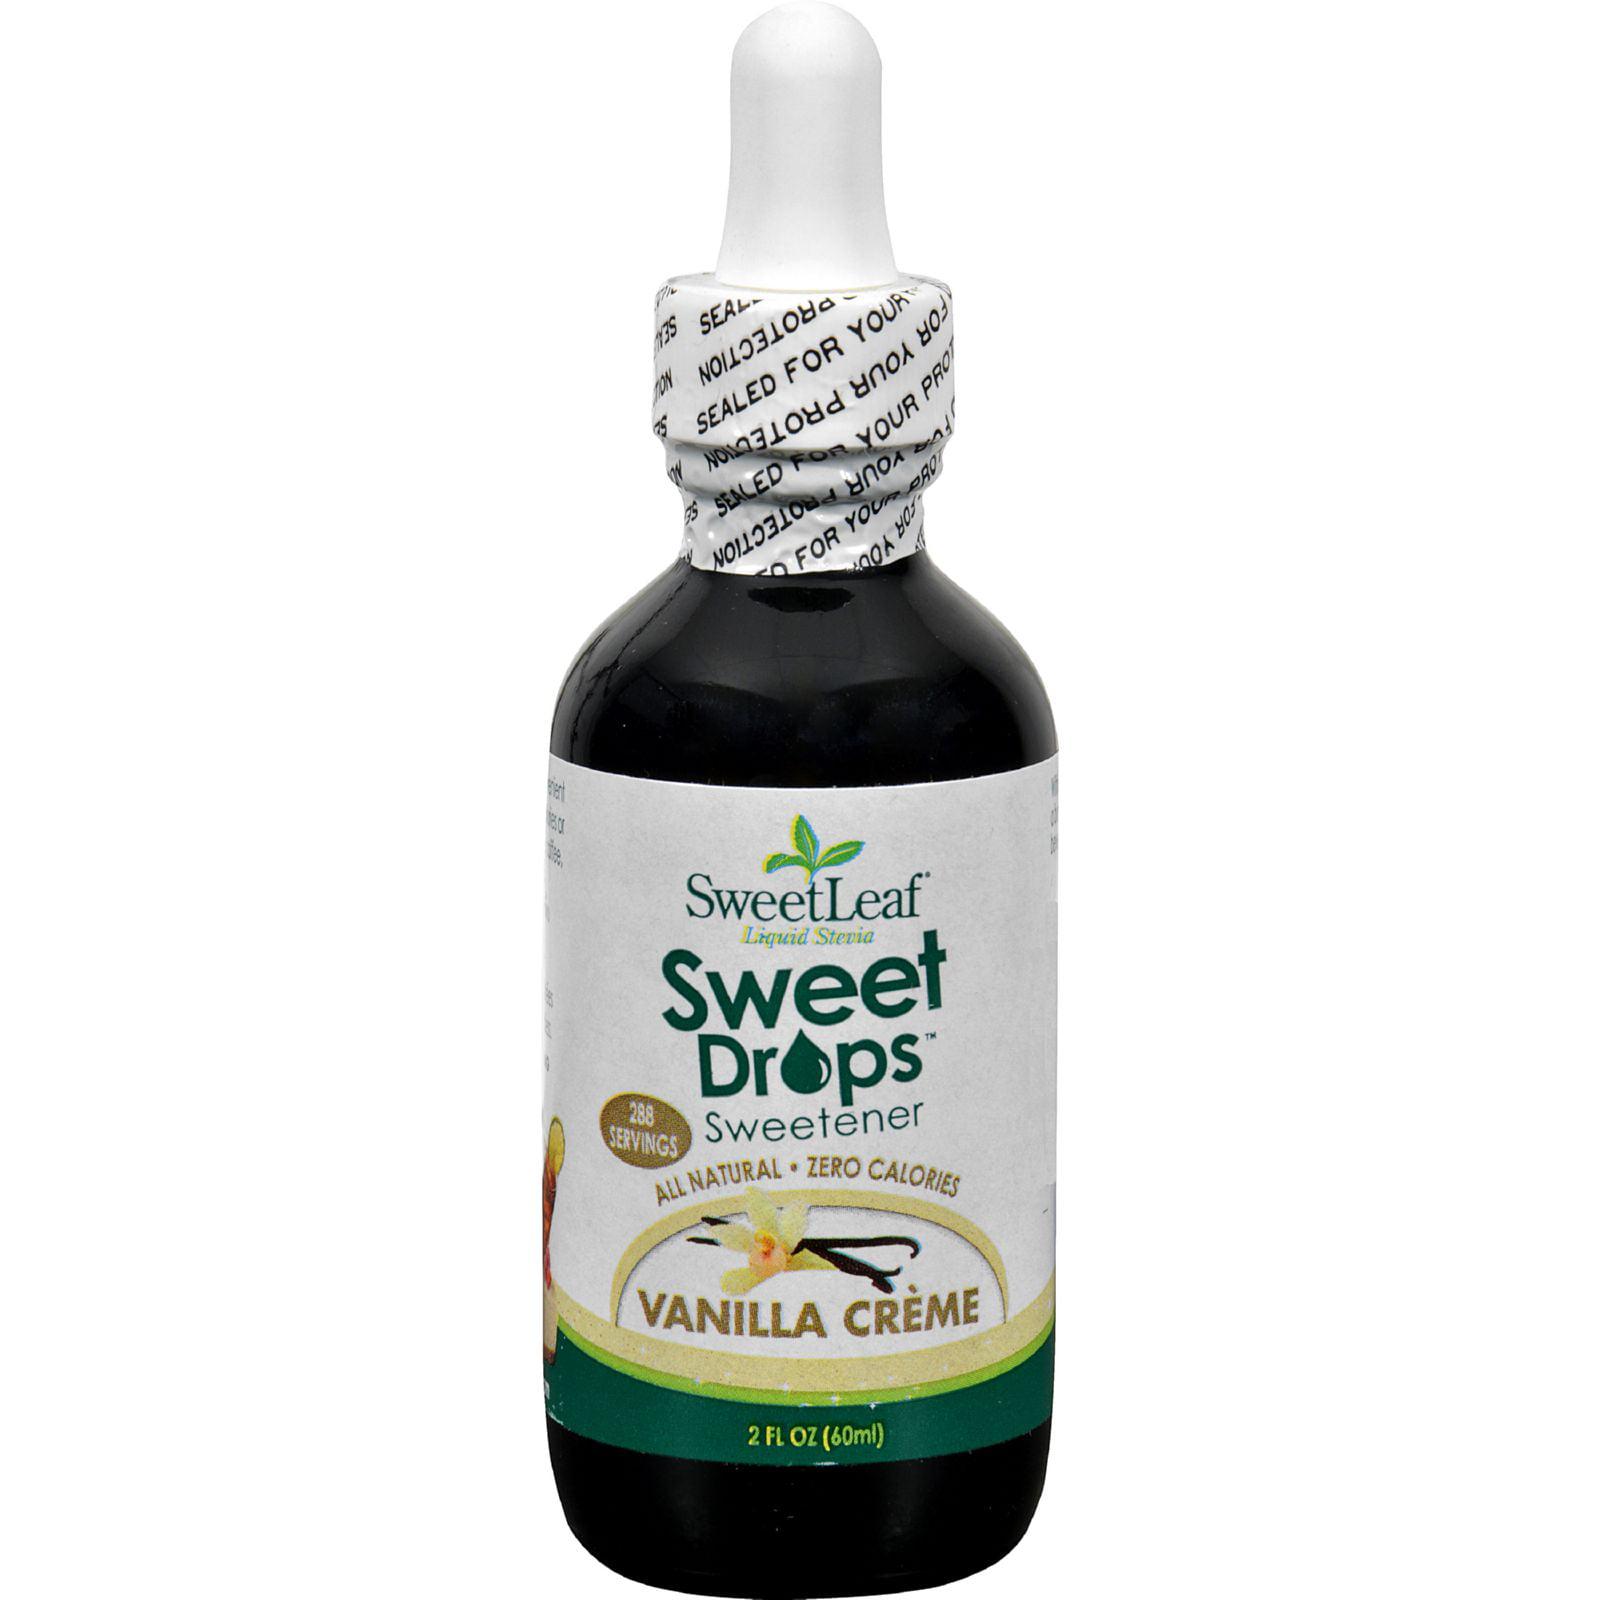 Sweet Leaf Sweet Drops Sweetener Vanilla Creme, 2.0 FL OZ